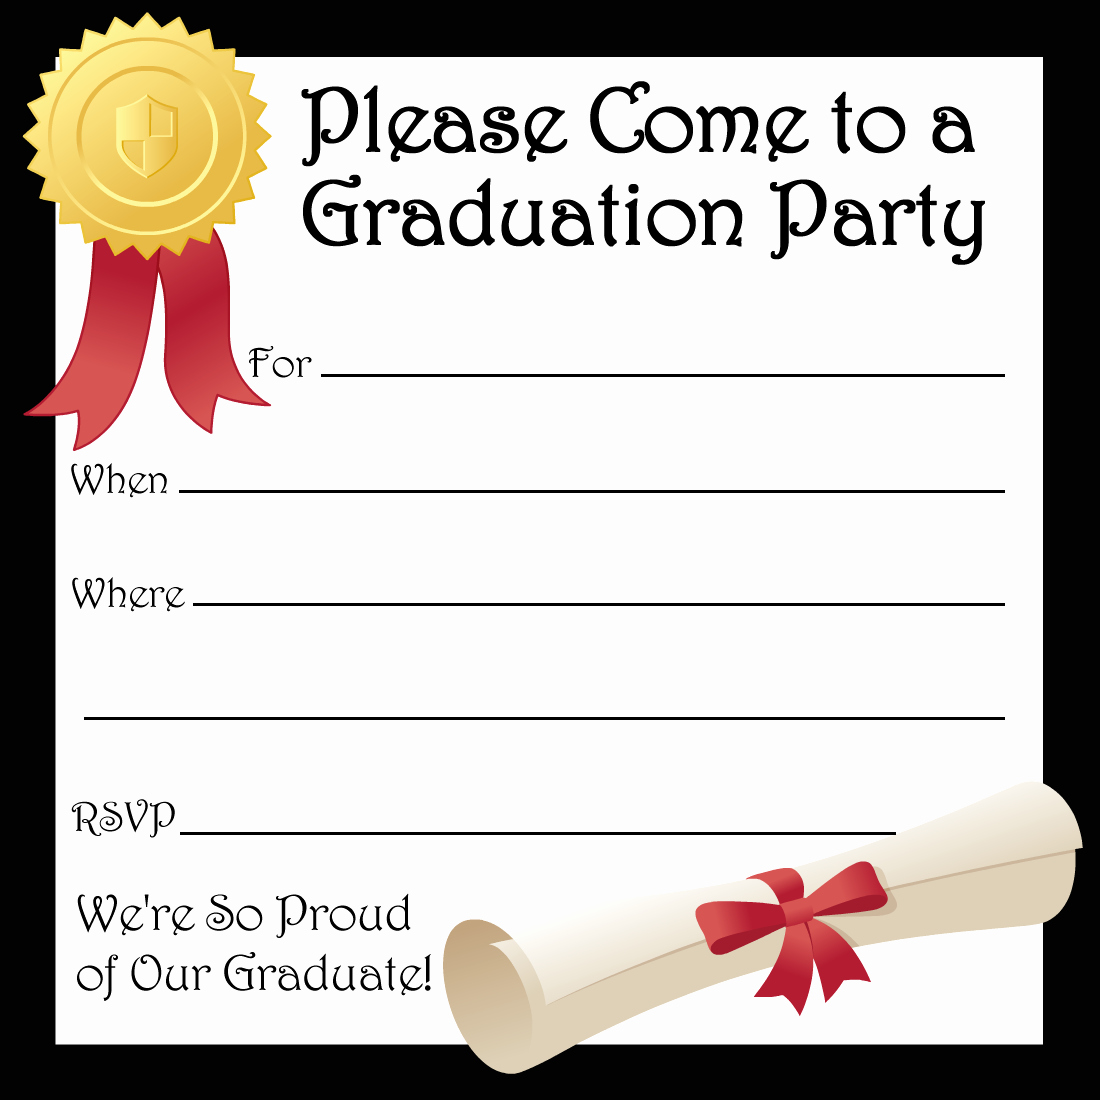 College Graduation Invitations Templates Unique Free Printable Graduation Party Invitations